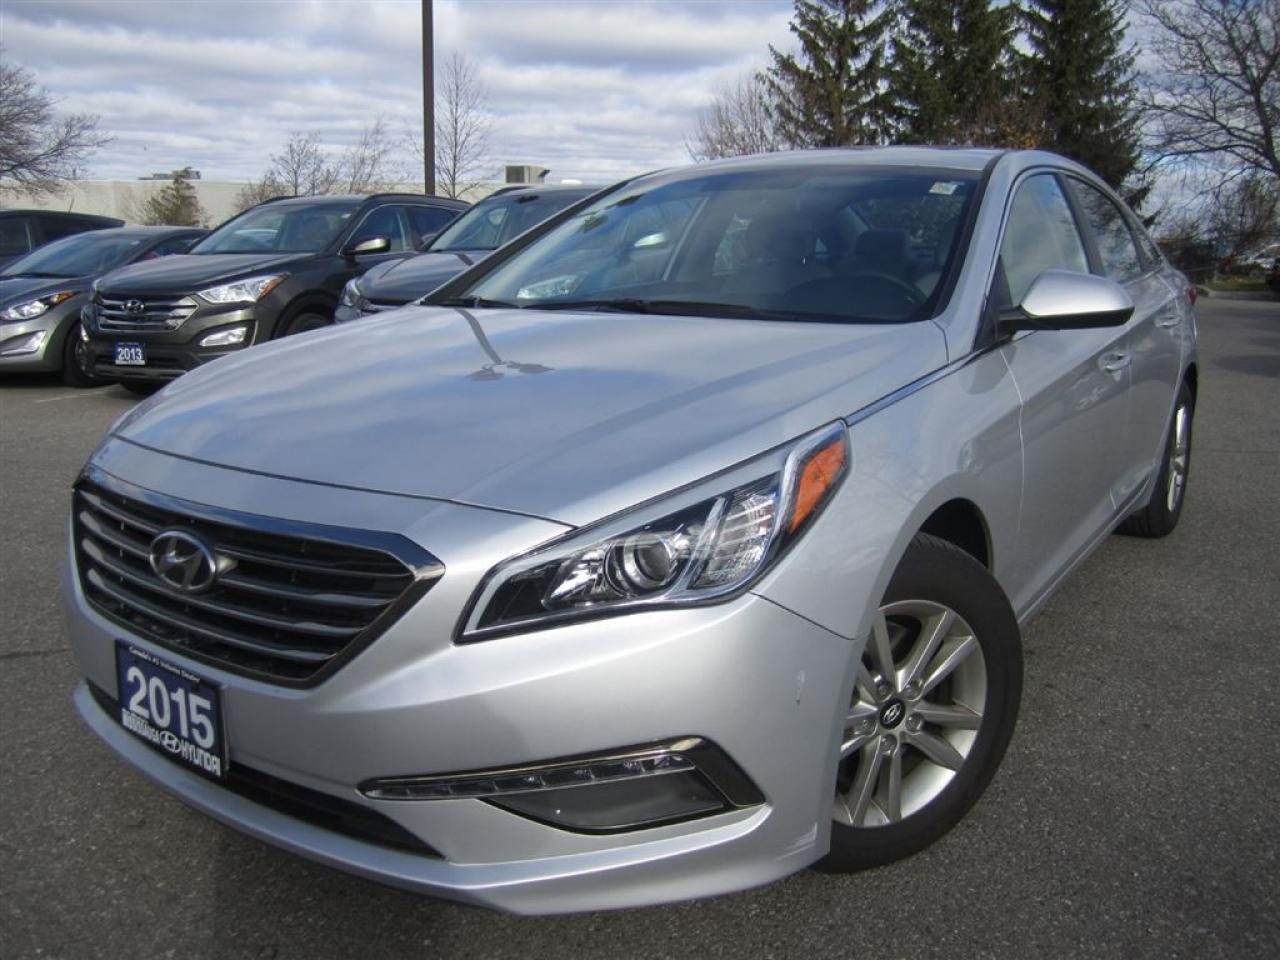 Photo of Silver 2015 Hyundai Sonata